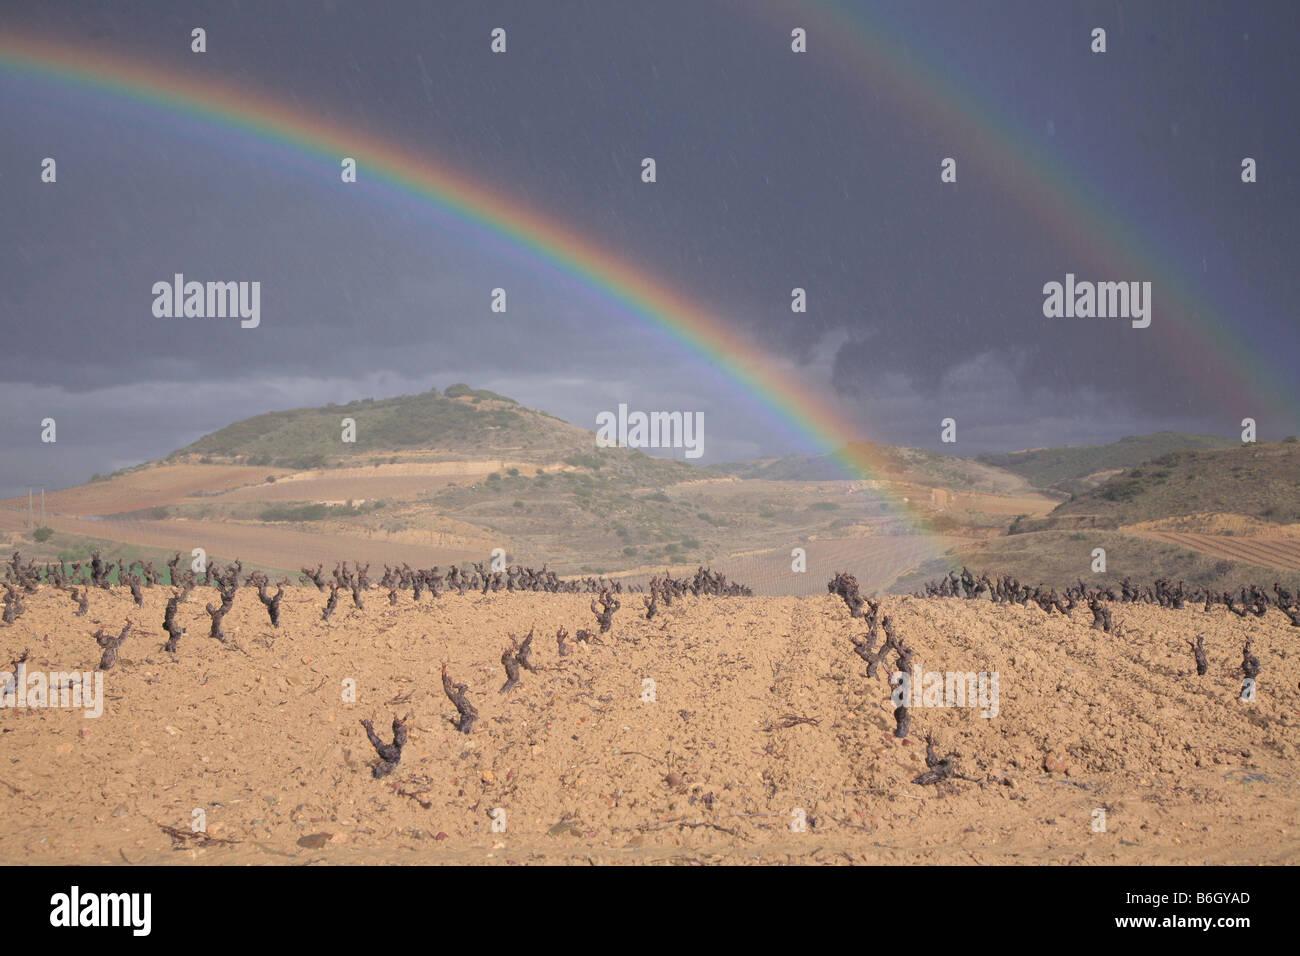 Rainbow in wine region of Rioja - Stock Image